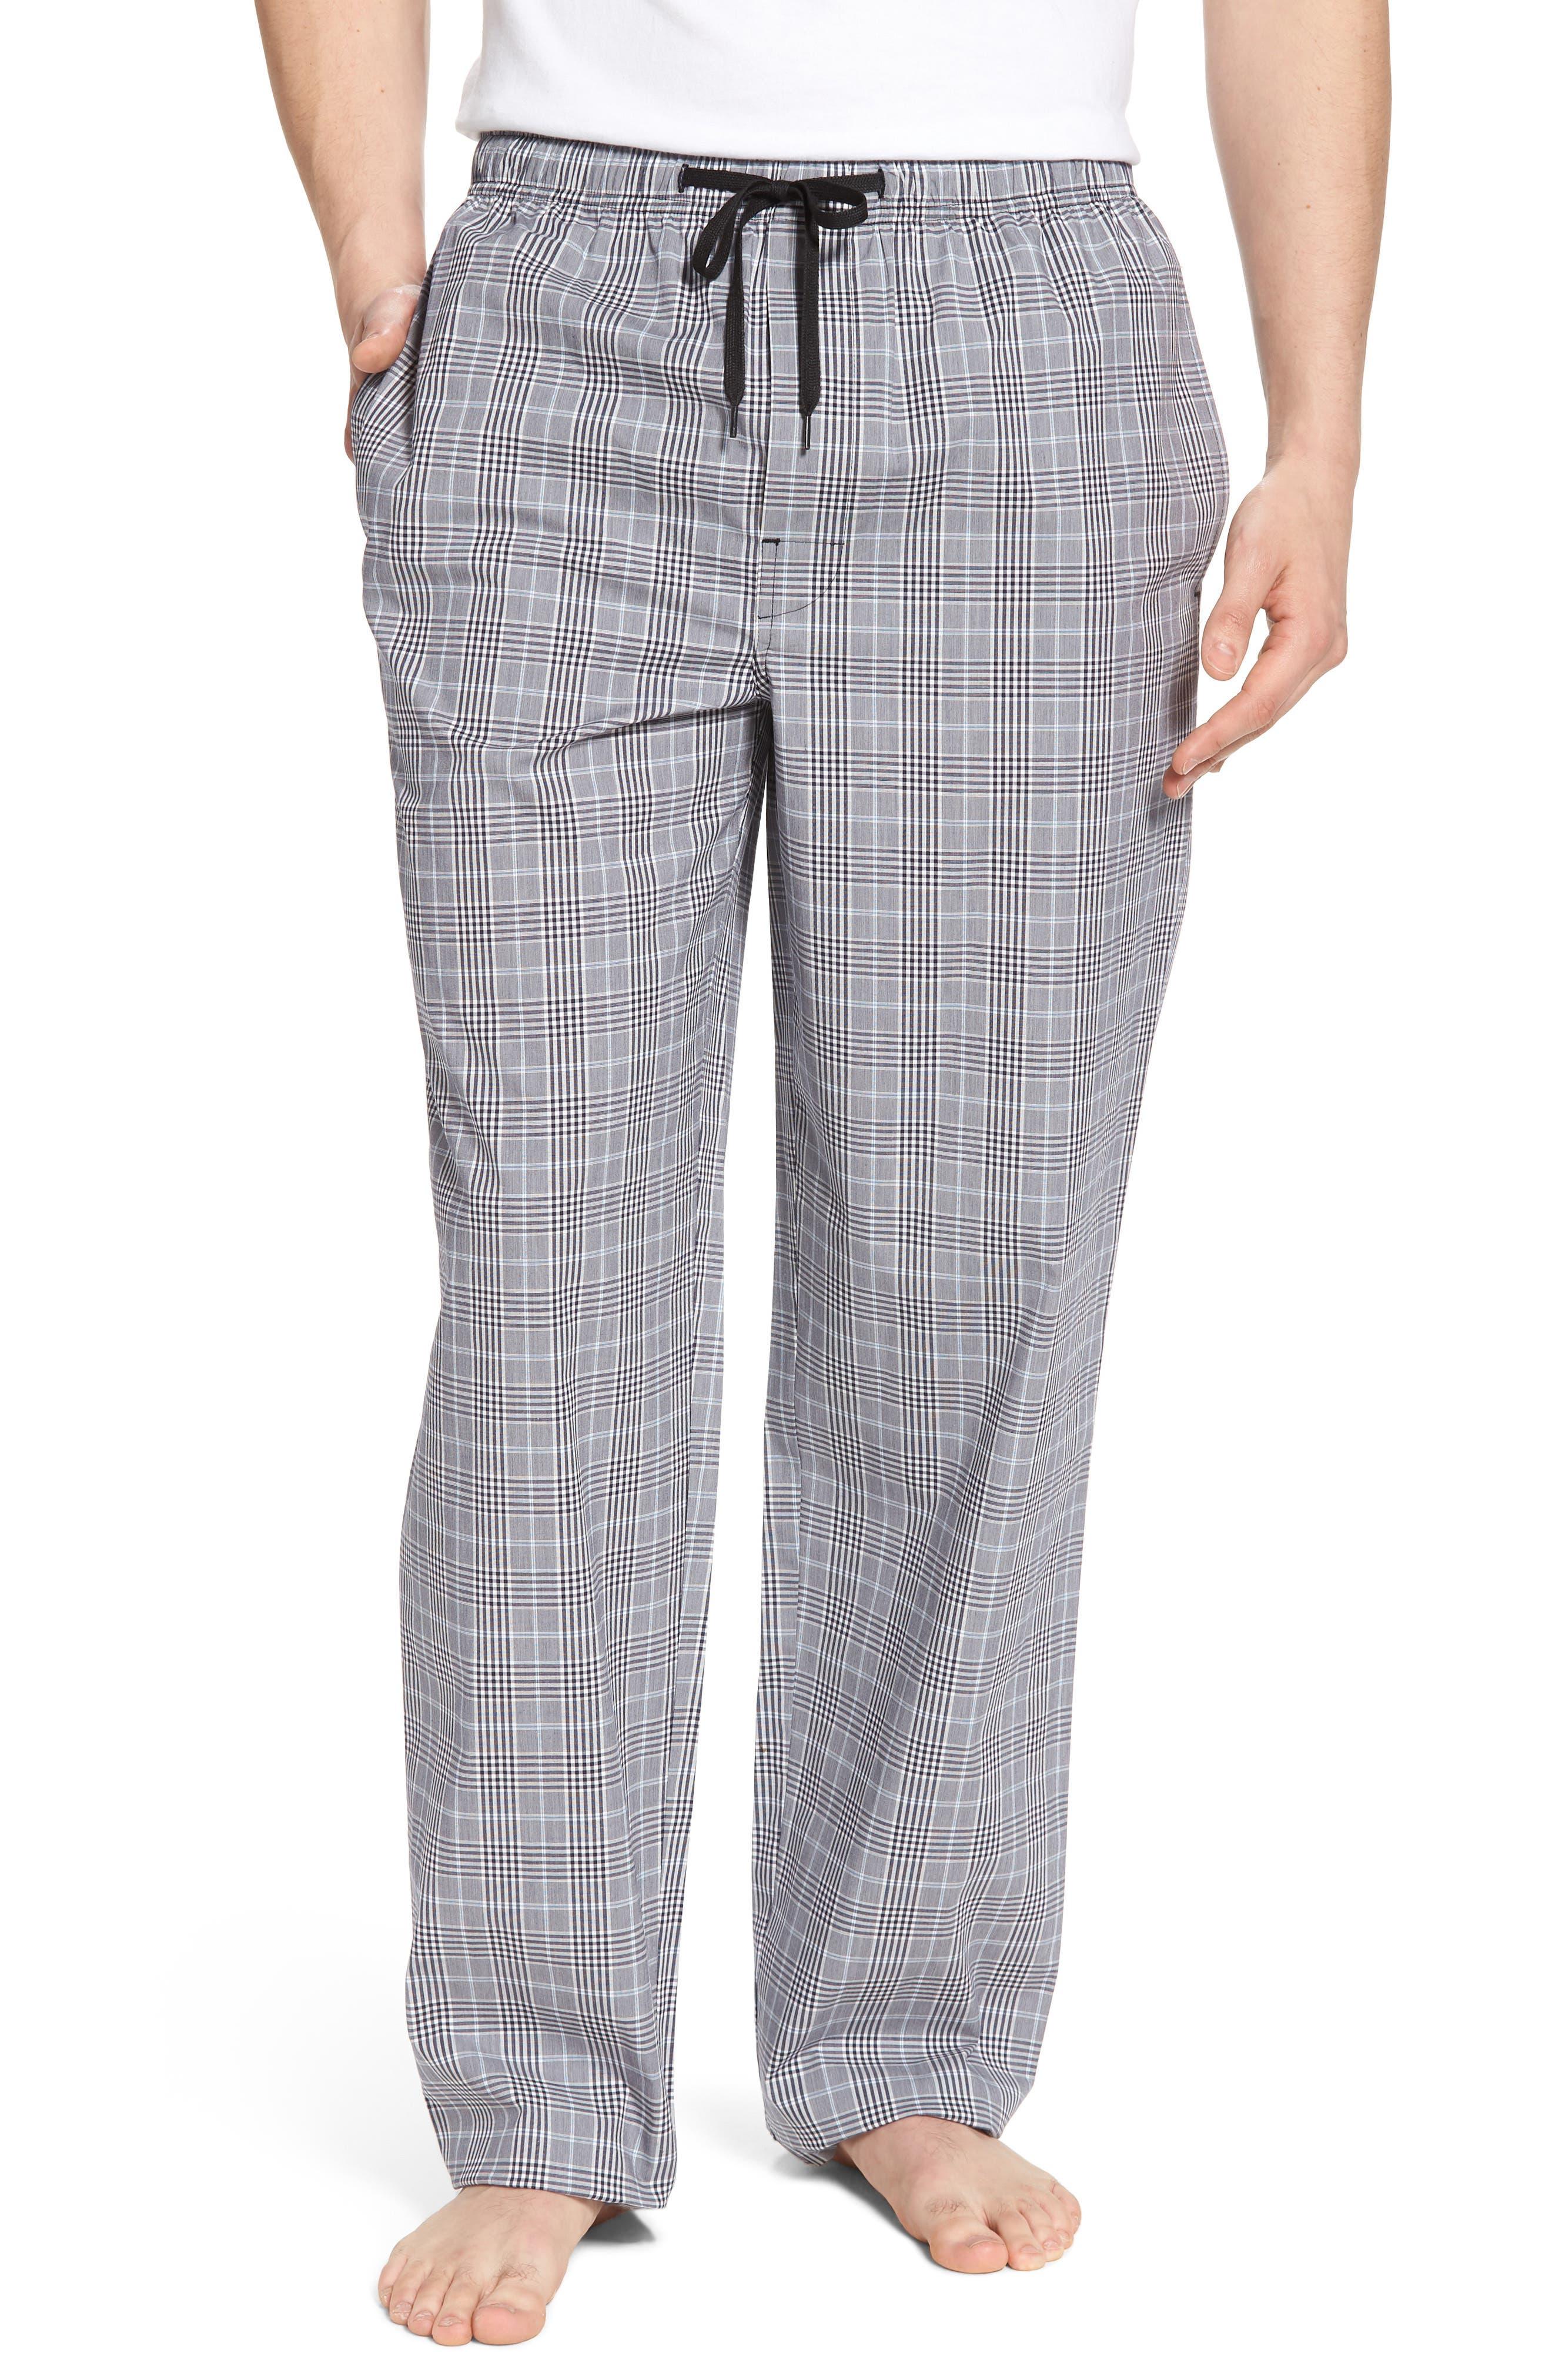 MAJESTIC INTERNATIONAL, Charleston Lounge Pants, Main thumbnail 1, color, BLACK PLAID